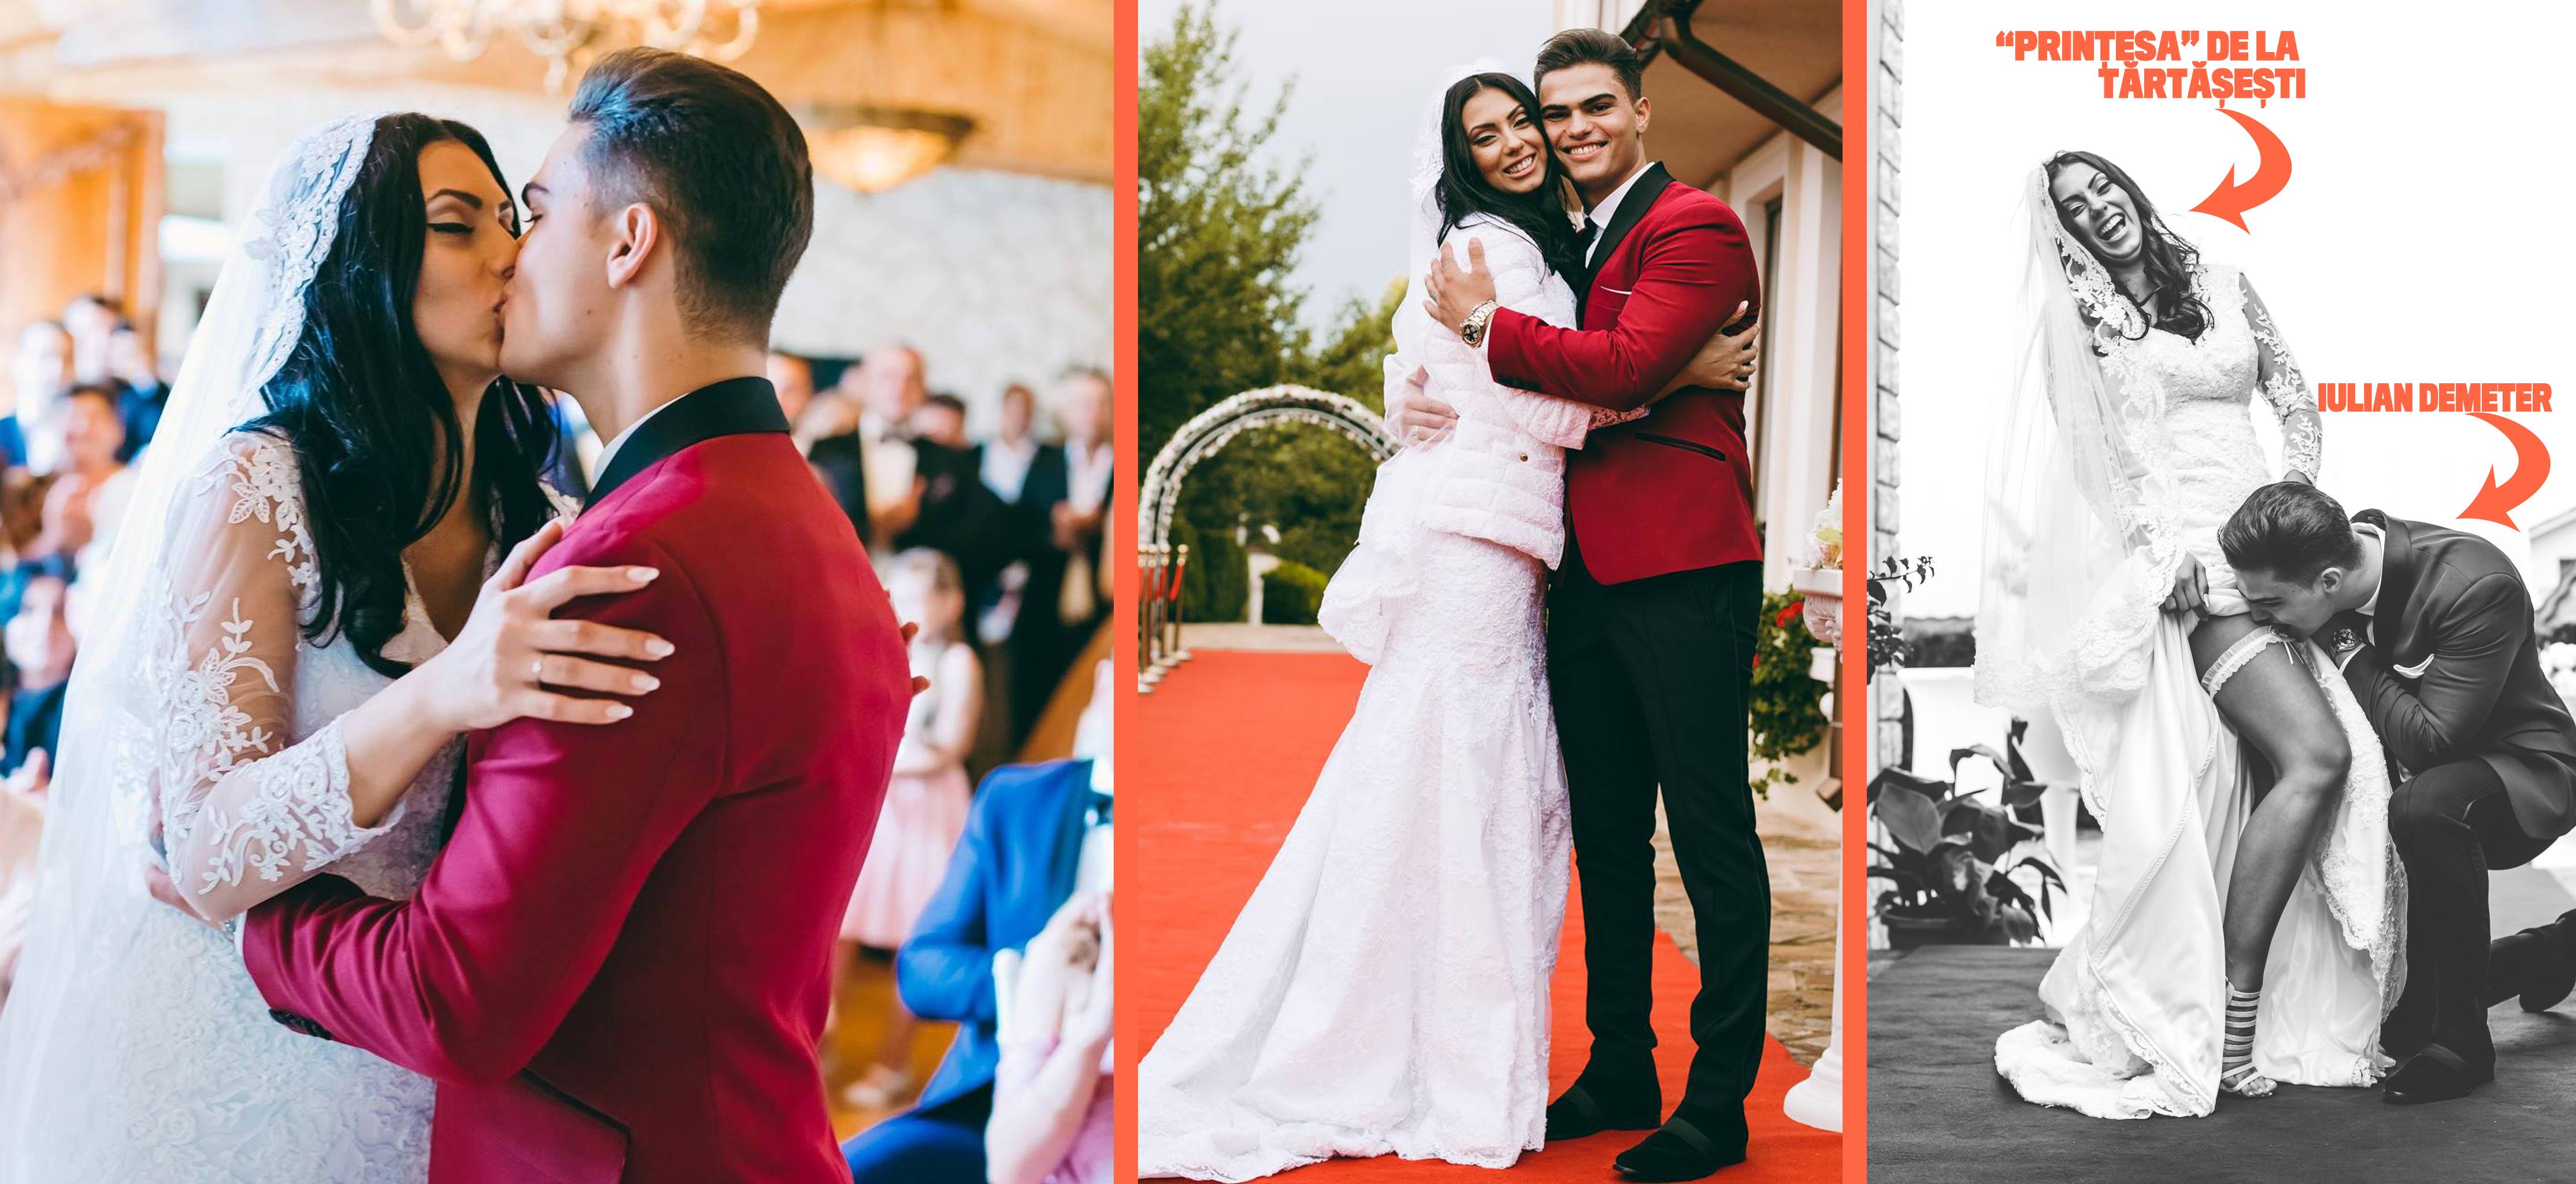 Nunta Anei Maria cu Iulian Demeter a fost desprinsa parca din basmele cu printese